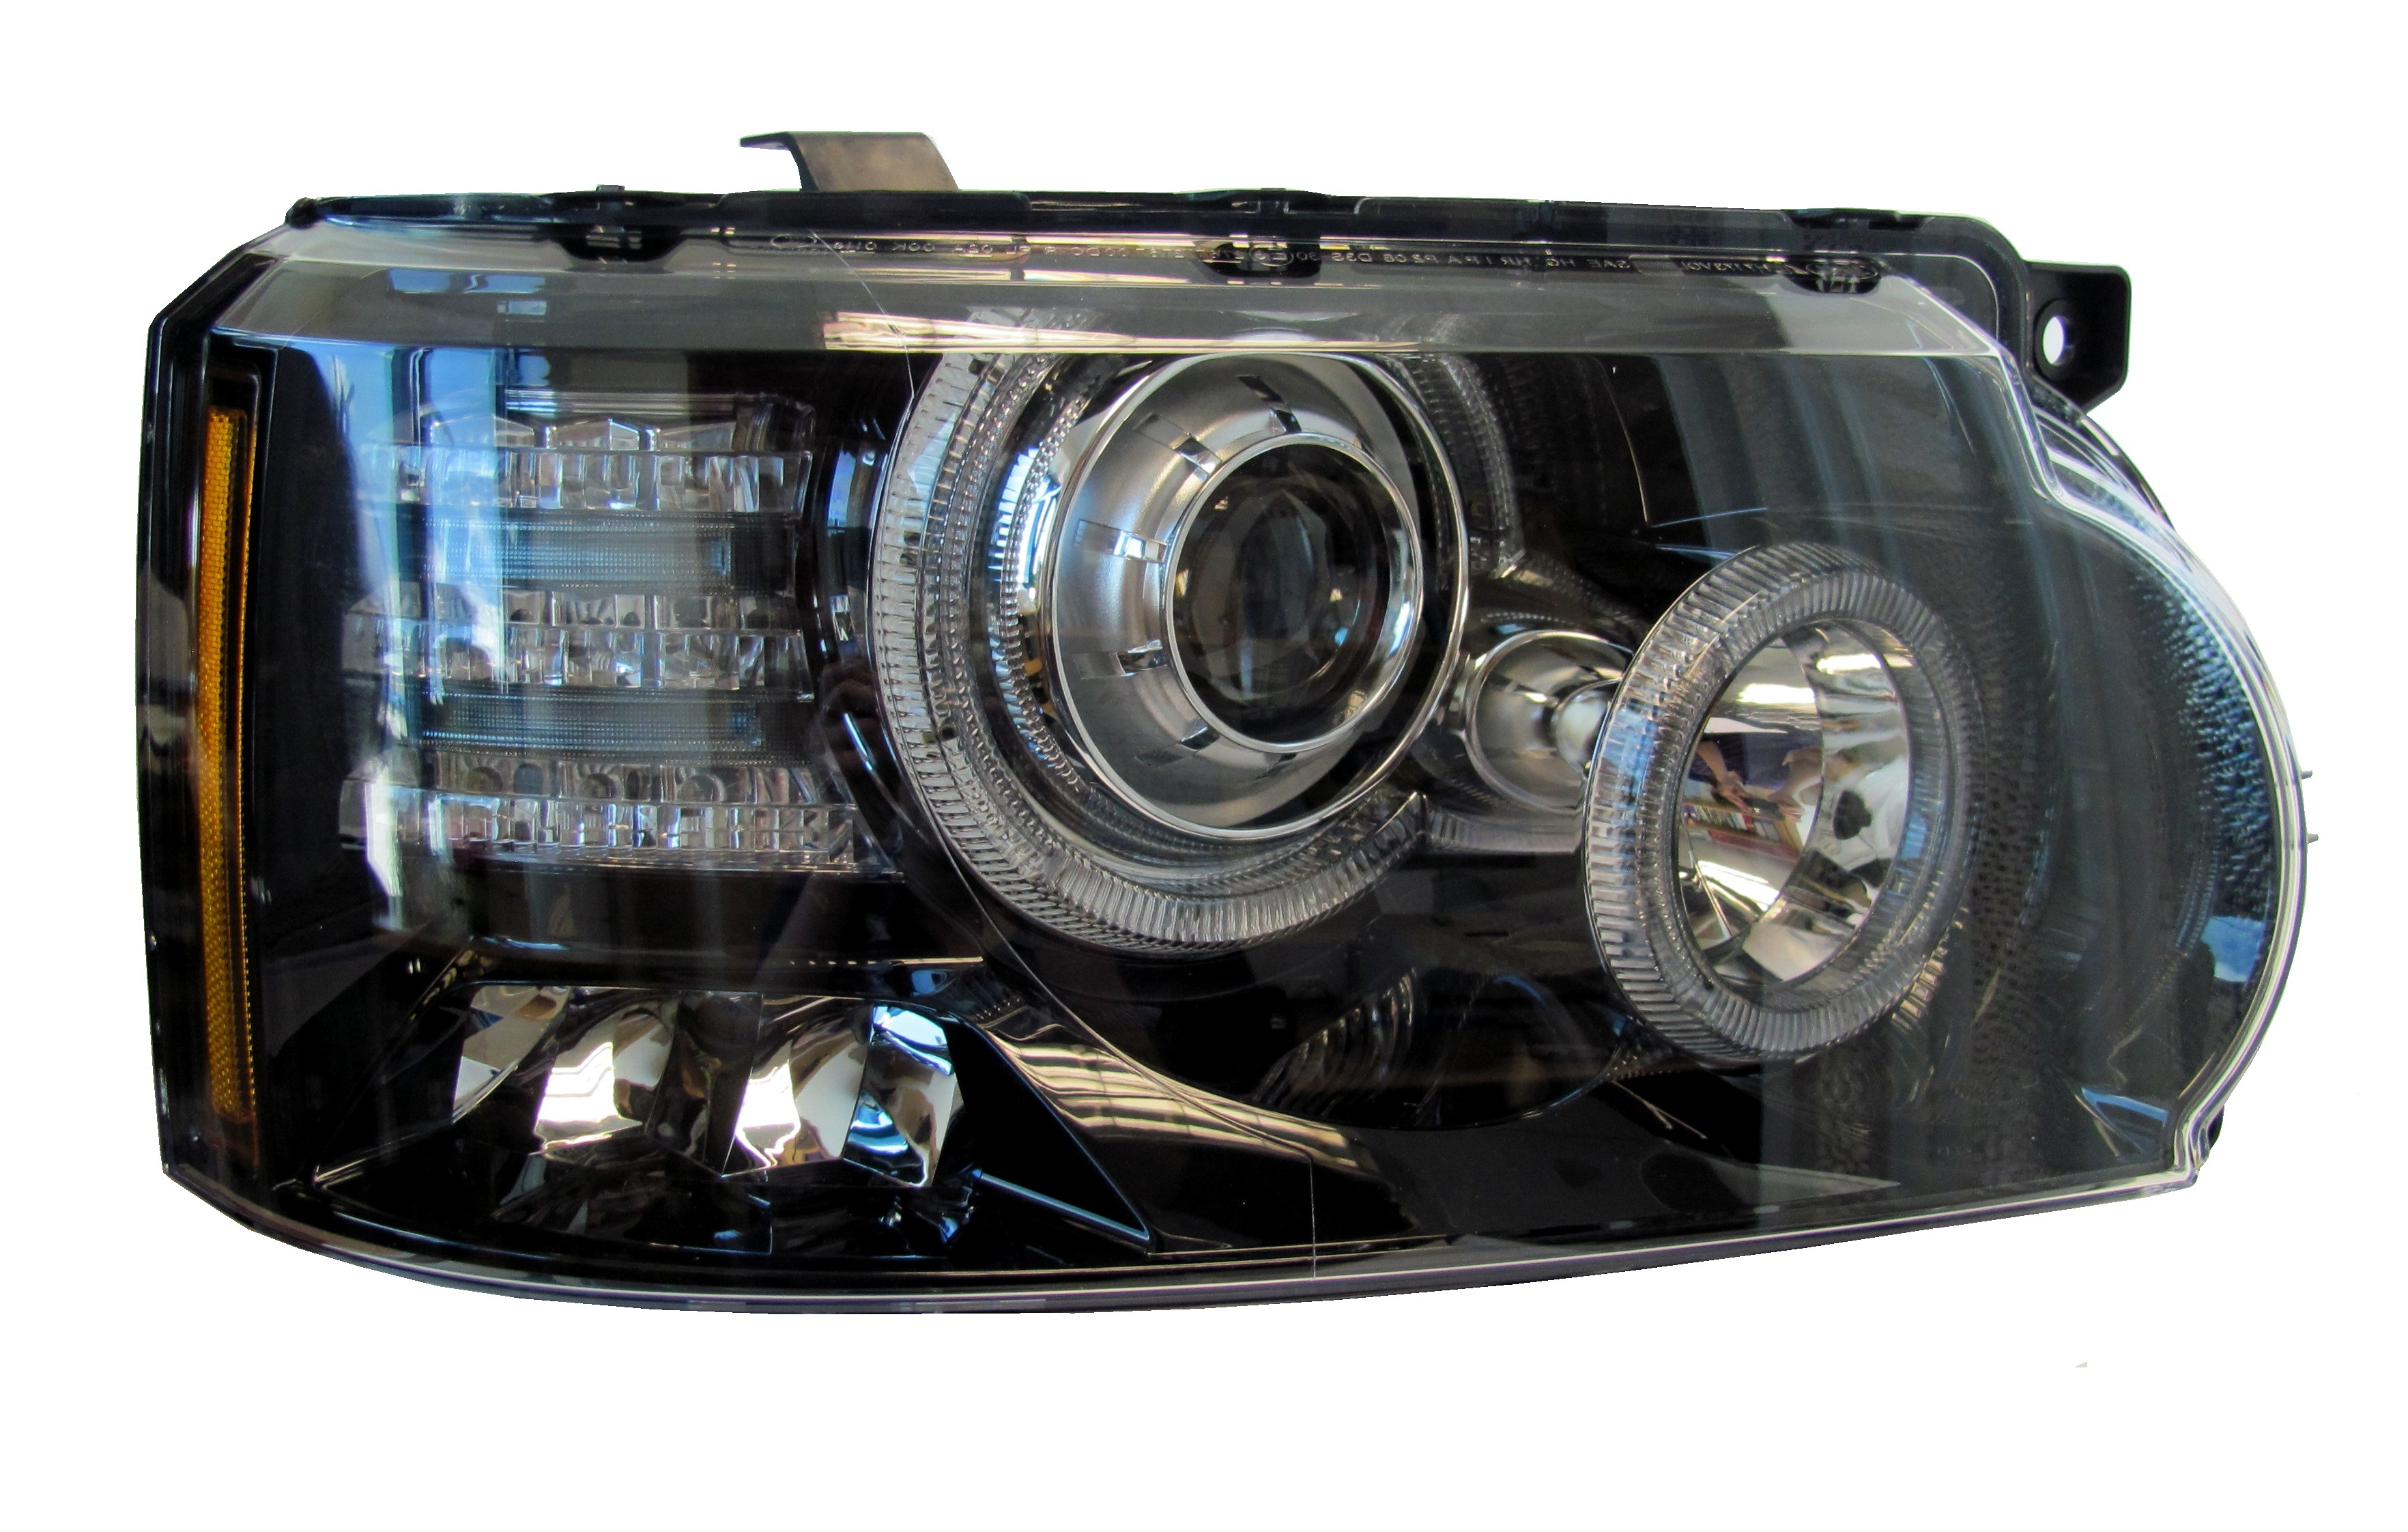 range rover l322 2010 bi xenon headlight afs rh lhd. Black Bedroom Furniture Sets. Home Design Ideas